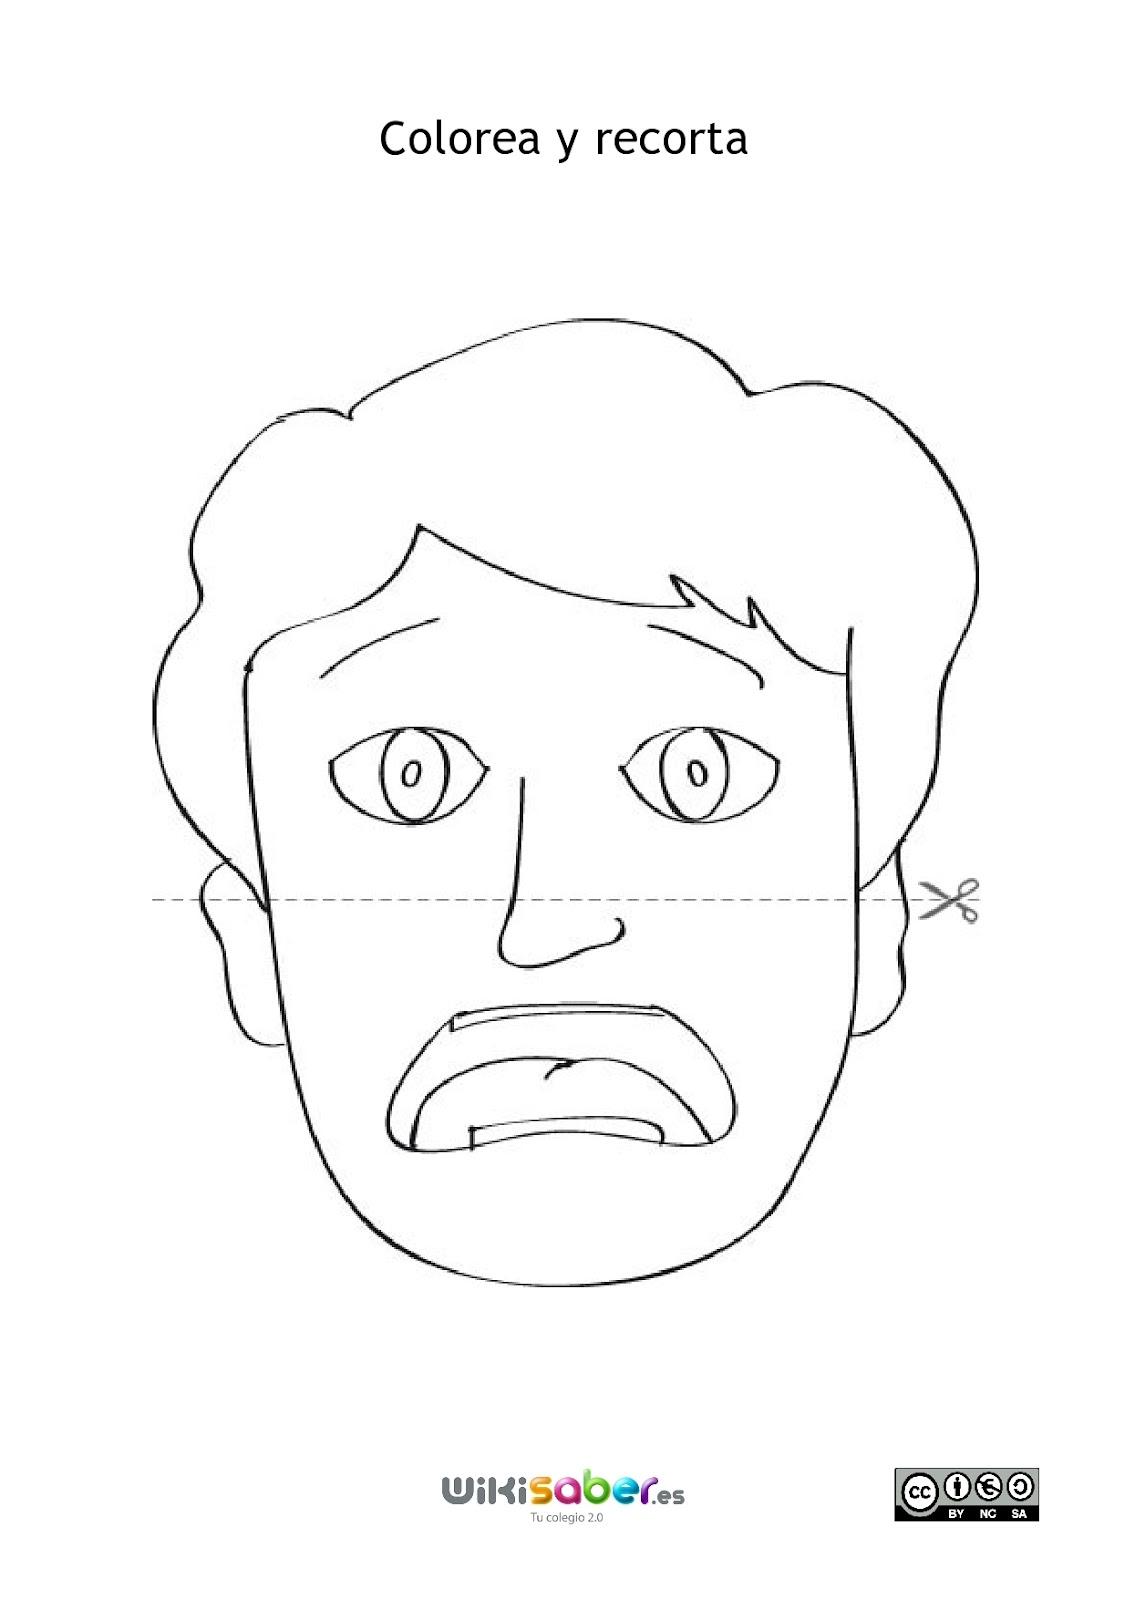 imagenes de caras con diferentes estados de animo para colorear